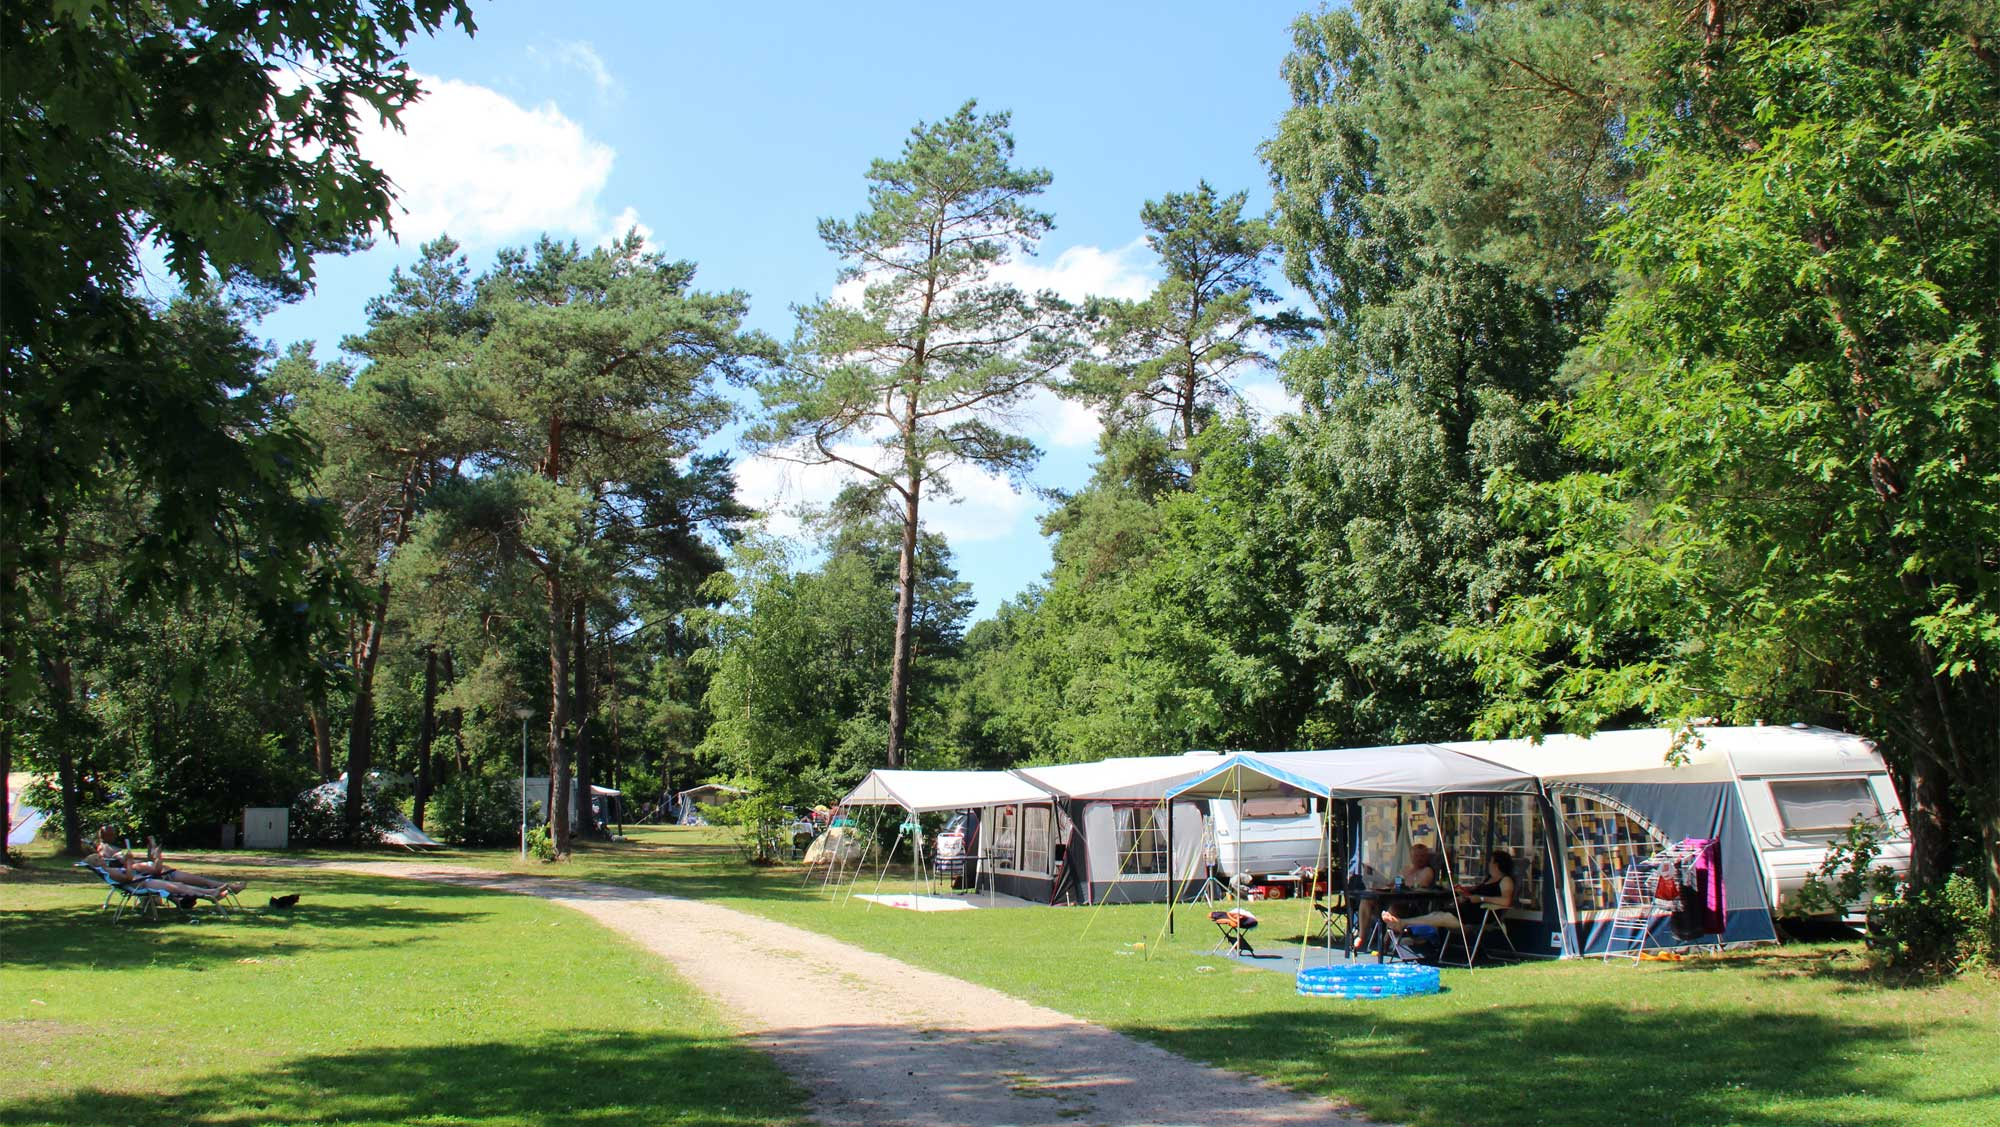 Molecaten Park De Koerberg 12 seizoenplaats